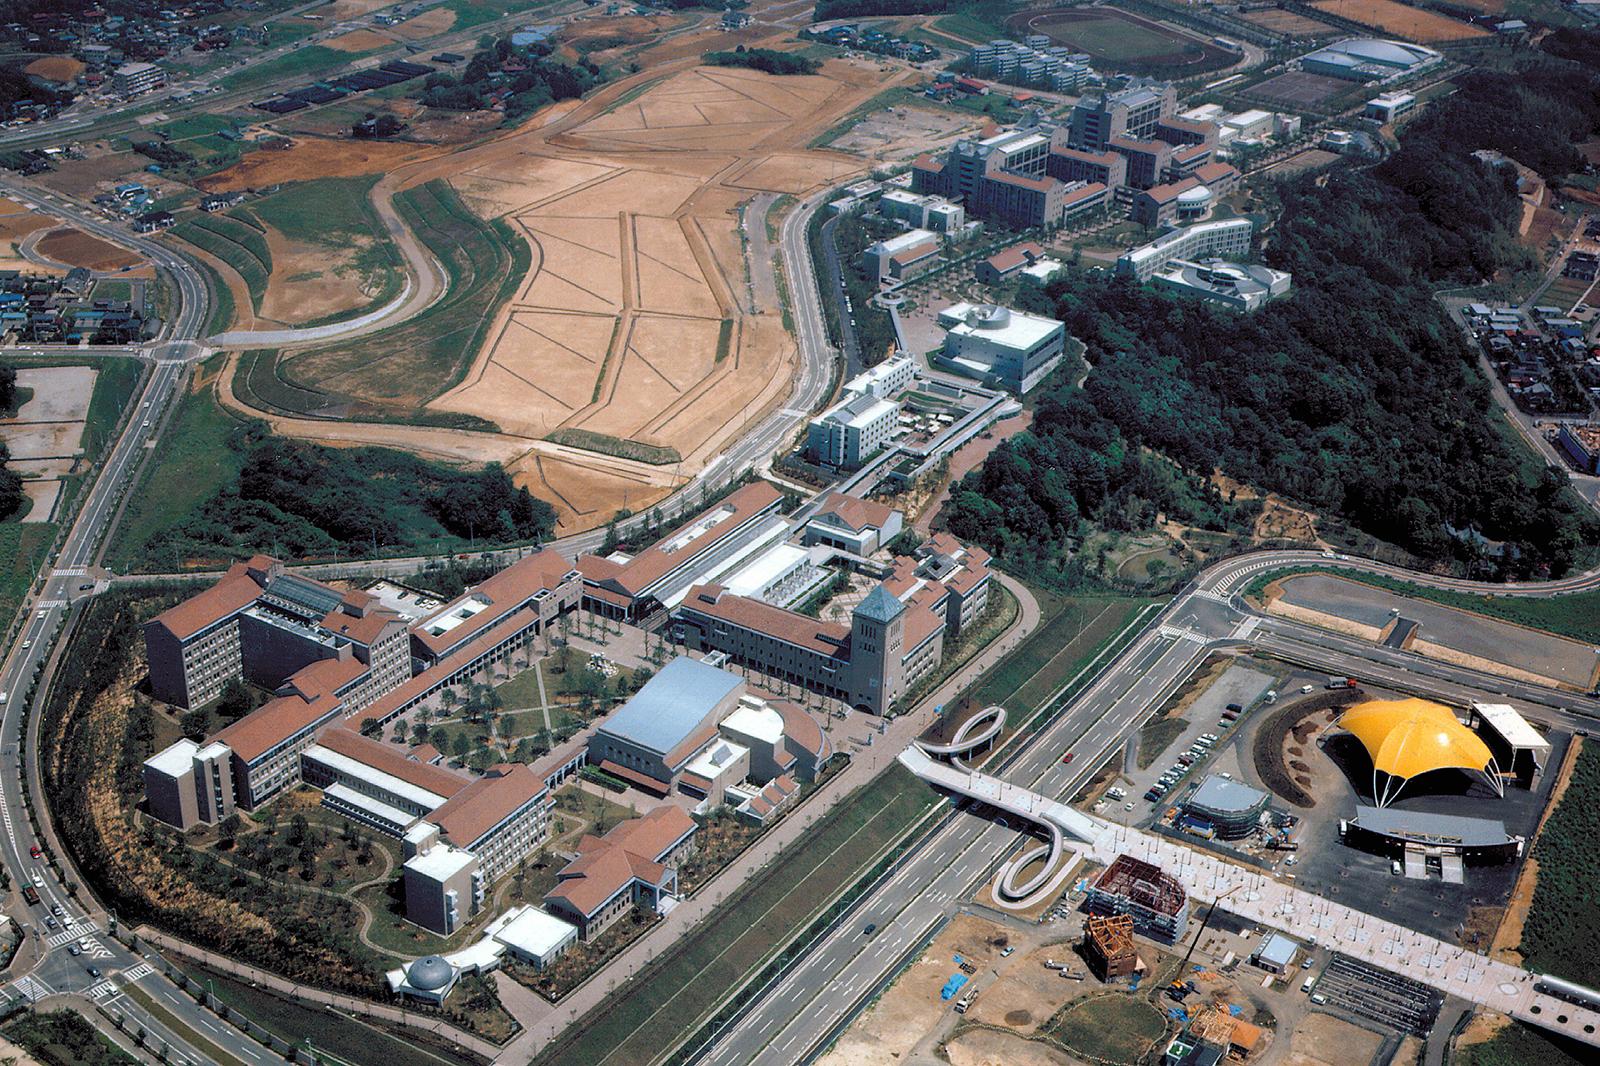 Tokyo Metropolitan University Minami-Osawa Campus